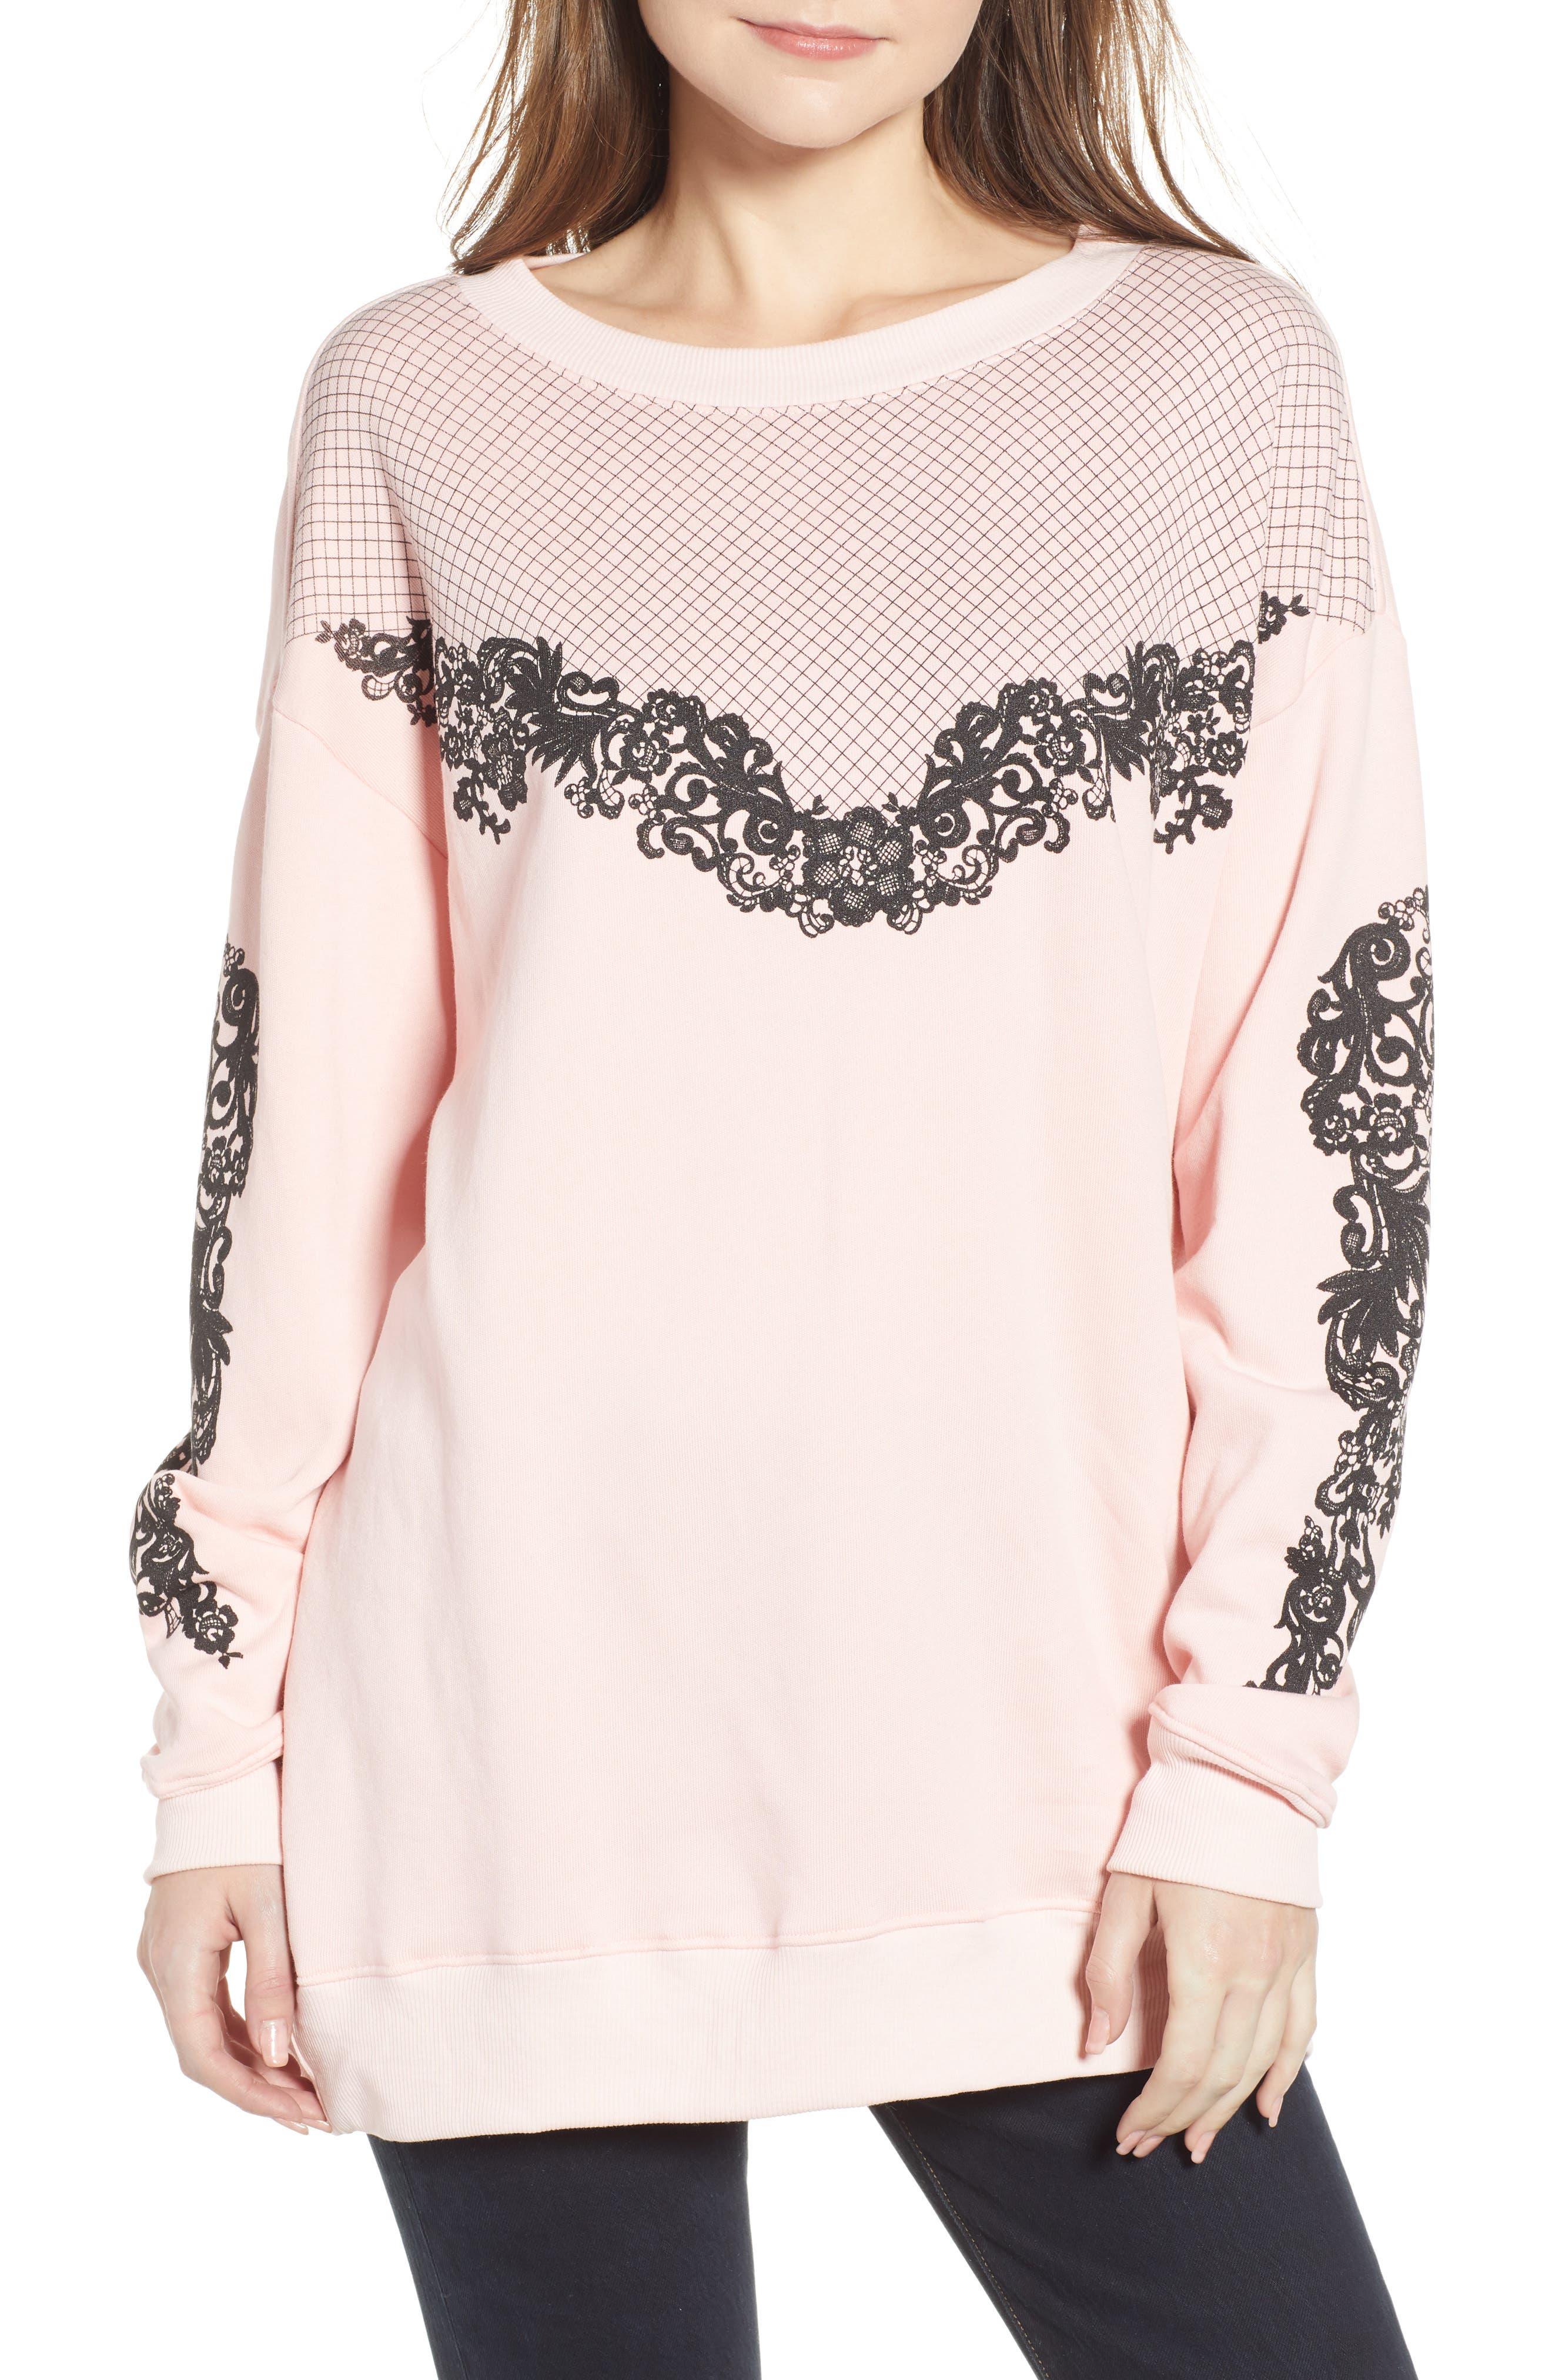 WILDFOX Chantilly Lace Roadtrip Sweatshirt in Romantic